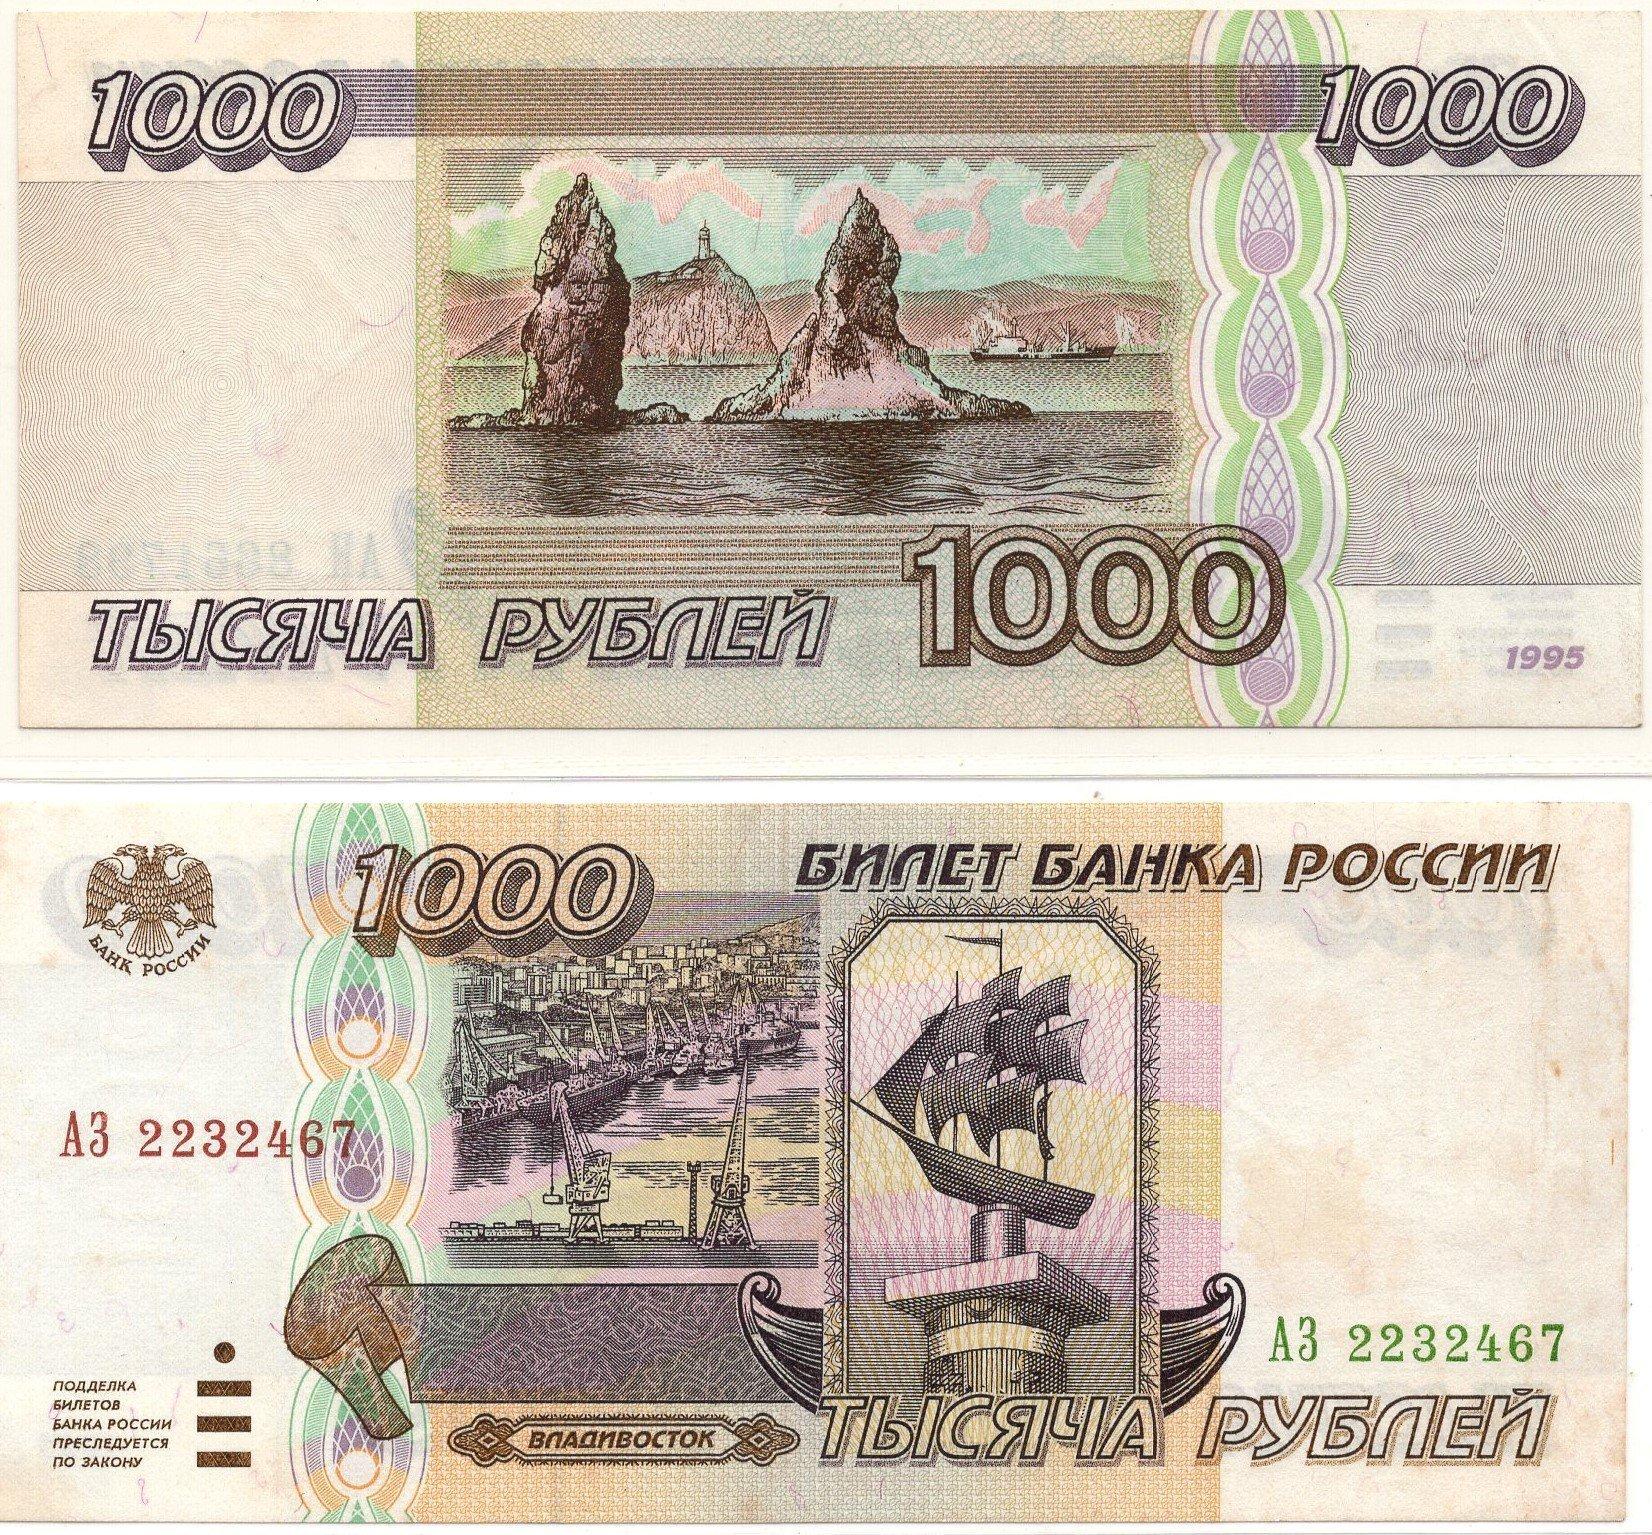 Russia 1000 roubles 1995 banknote for sa;e